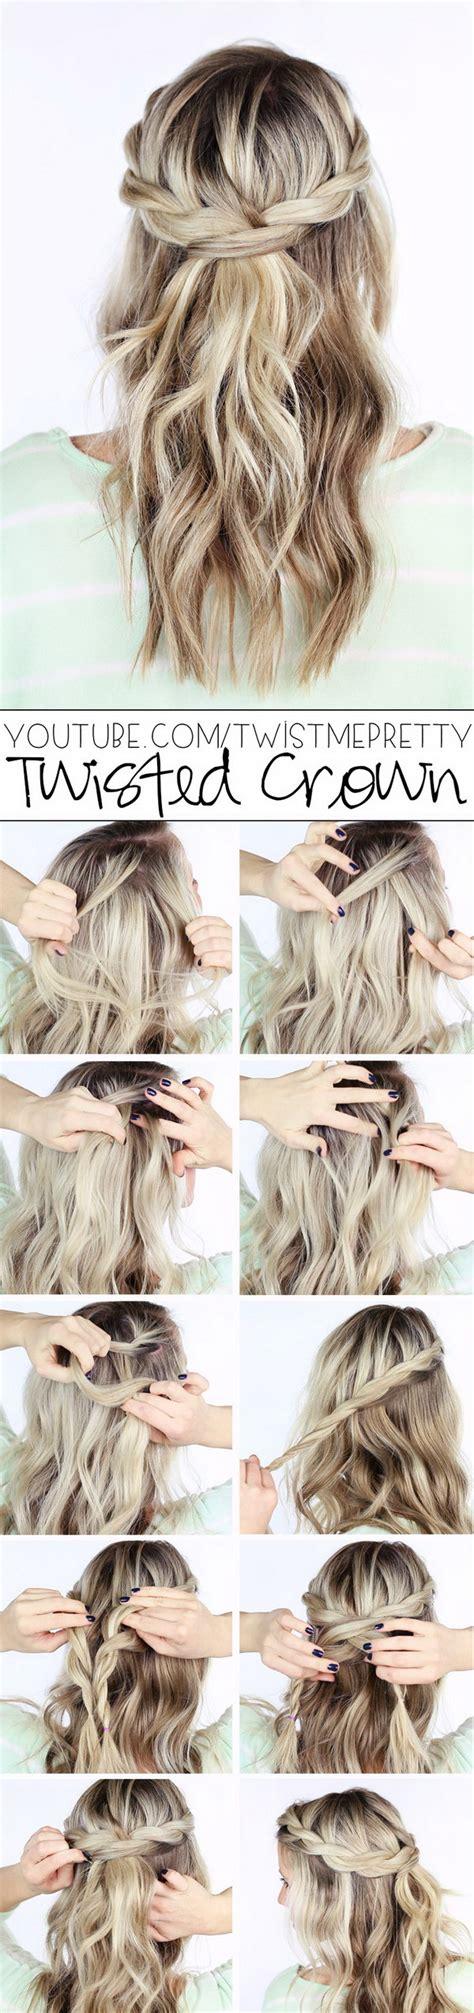 easy diy half up half down hairstyles 55 stunning half up half down hairstyles